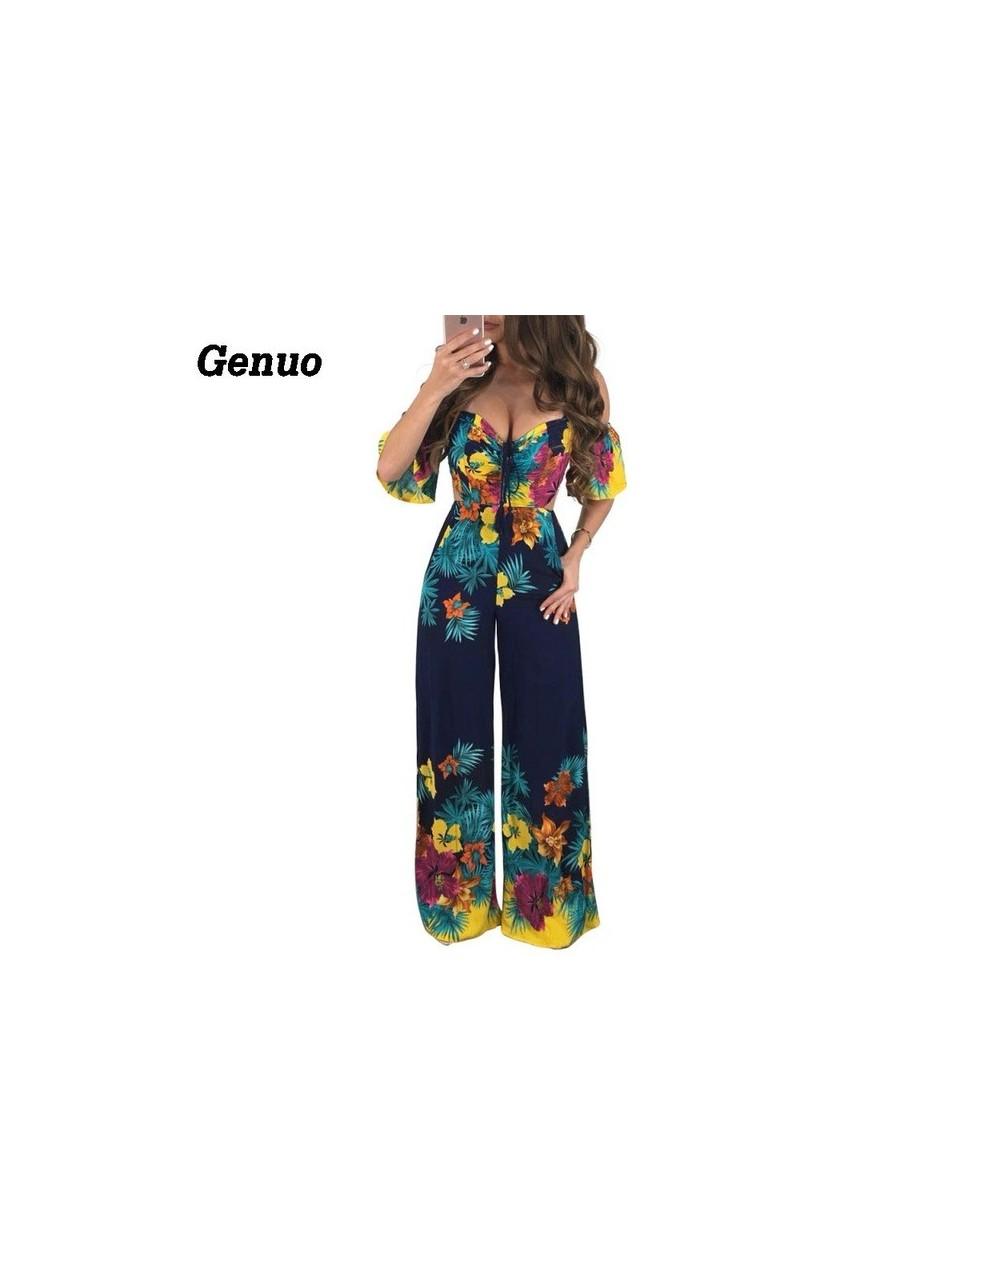 Womens Boho Beach Jumpsuit Party Clubwear Bandage Floral Playsuit Elegant Sleeveless Romper combinaison pantalon femme - Blu...